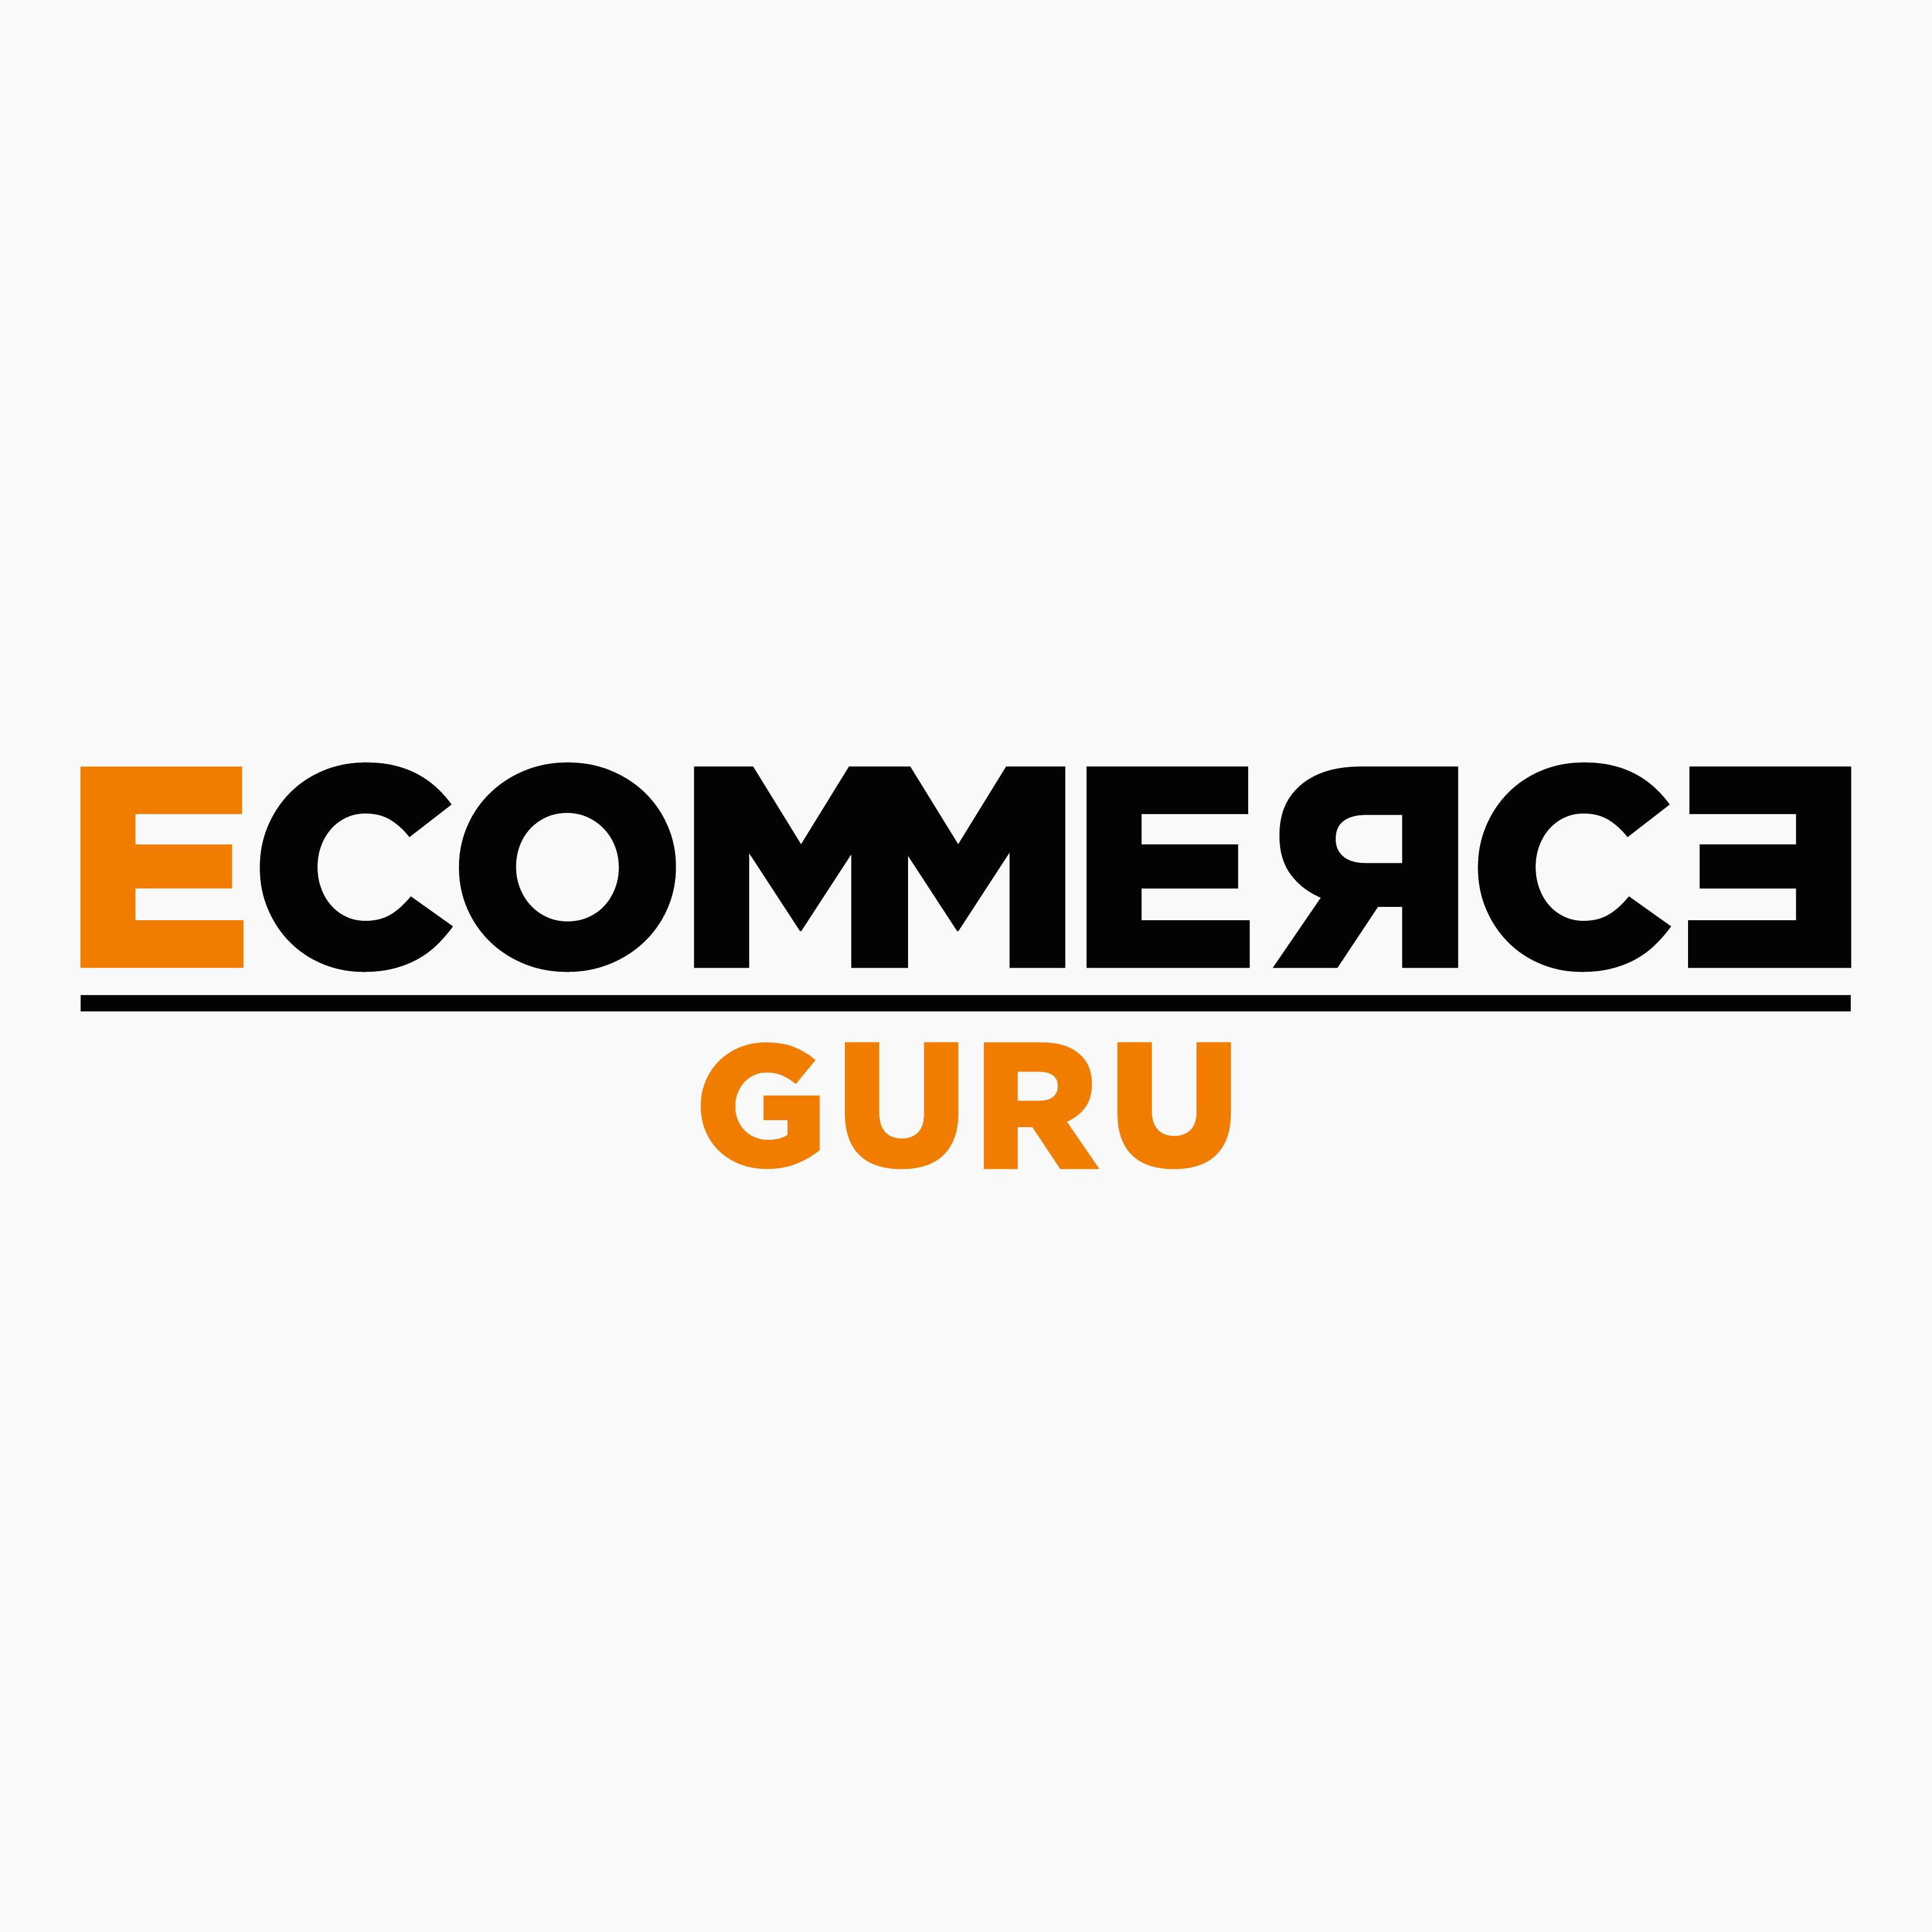 Jusan Network Ecommerceguru